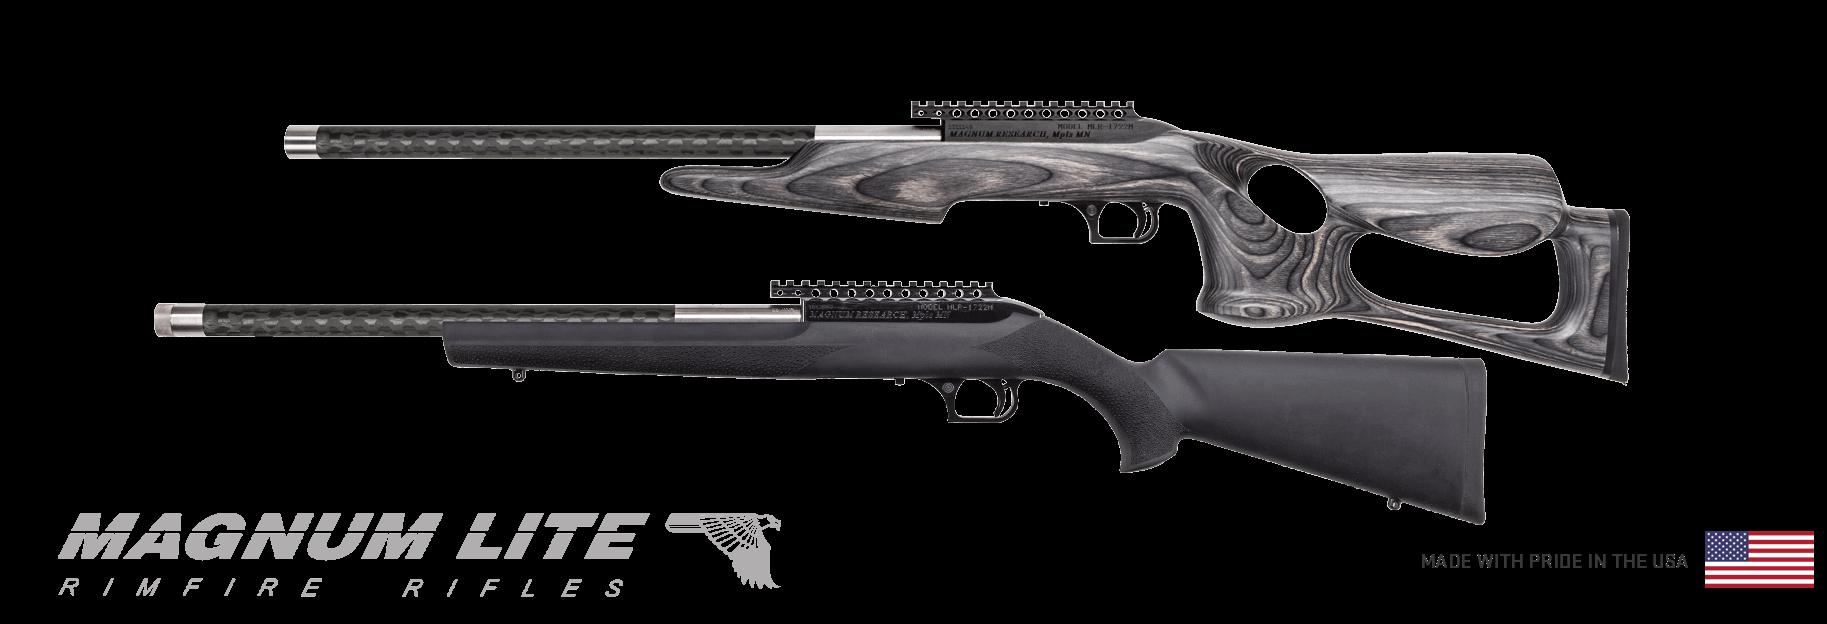 Magnum Lite  22 LR /  22 WMR - Magnum Research, Inc  | Desert Eagle